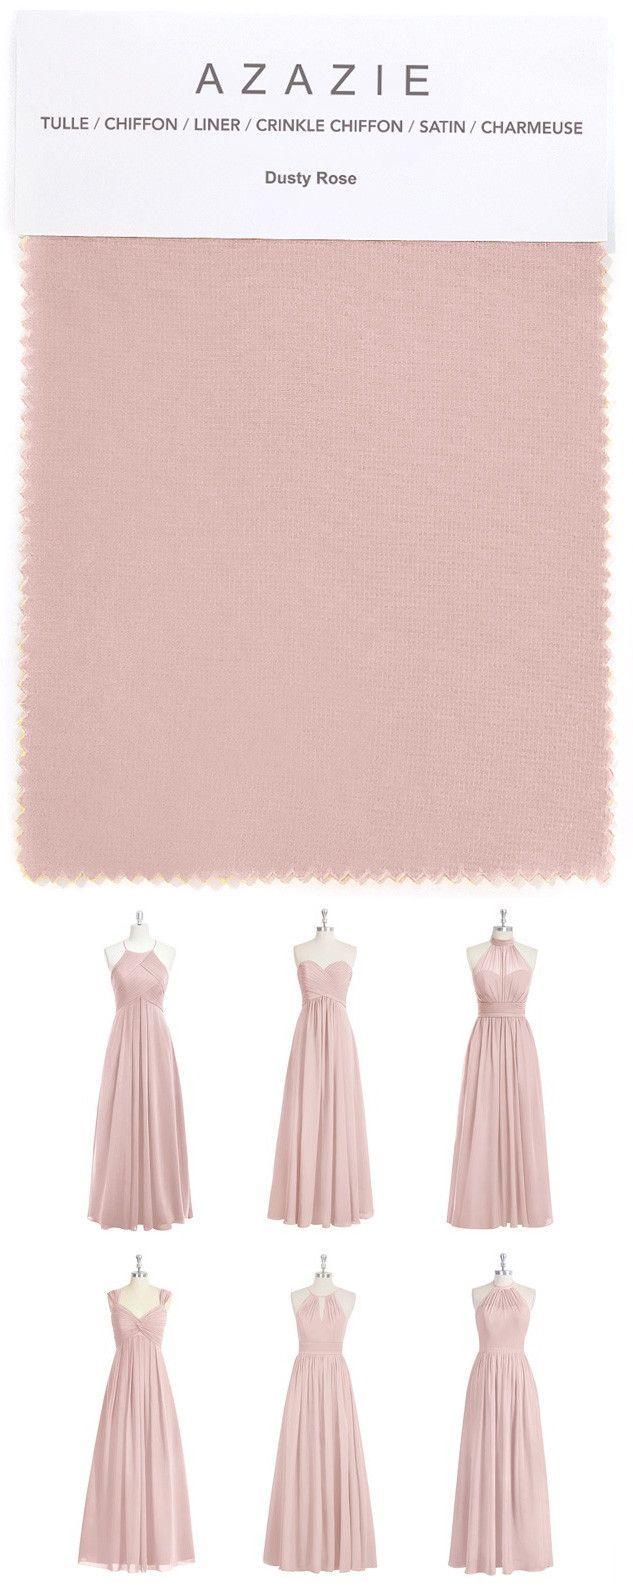 Azazie dusty rose swatch in 6 fabrics pink dusty rose chiffon azazie dusty rose swatch in 6 fabrics pink dusty rose chiffon ombrellifo Choice Image